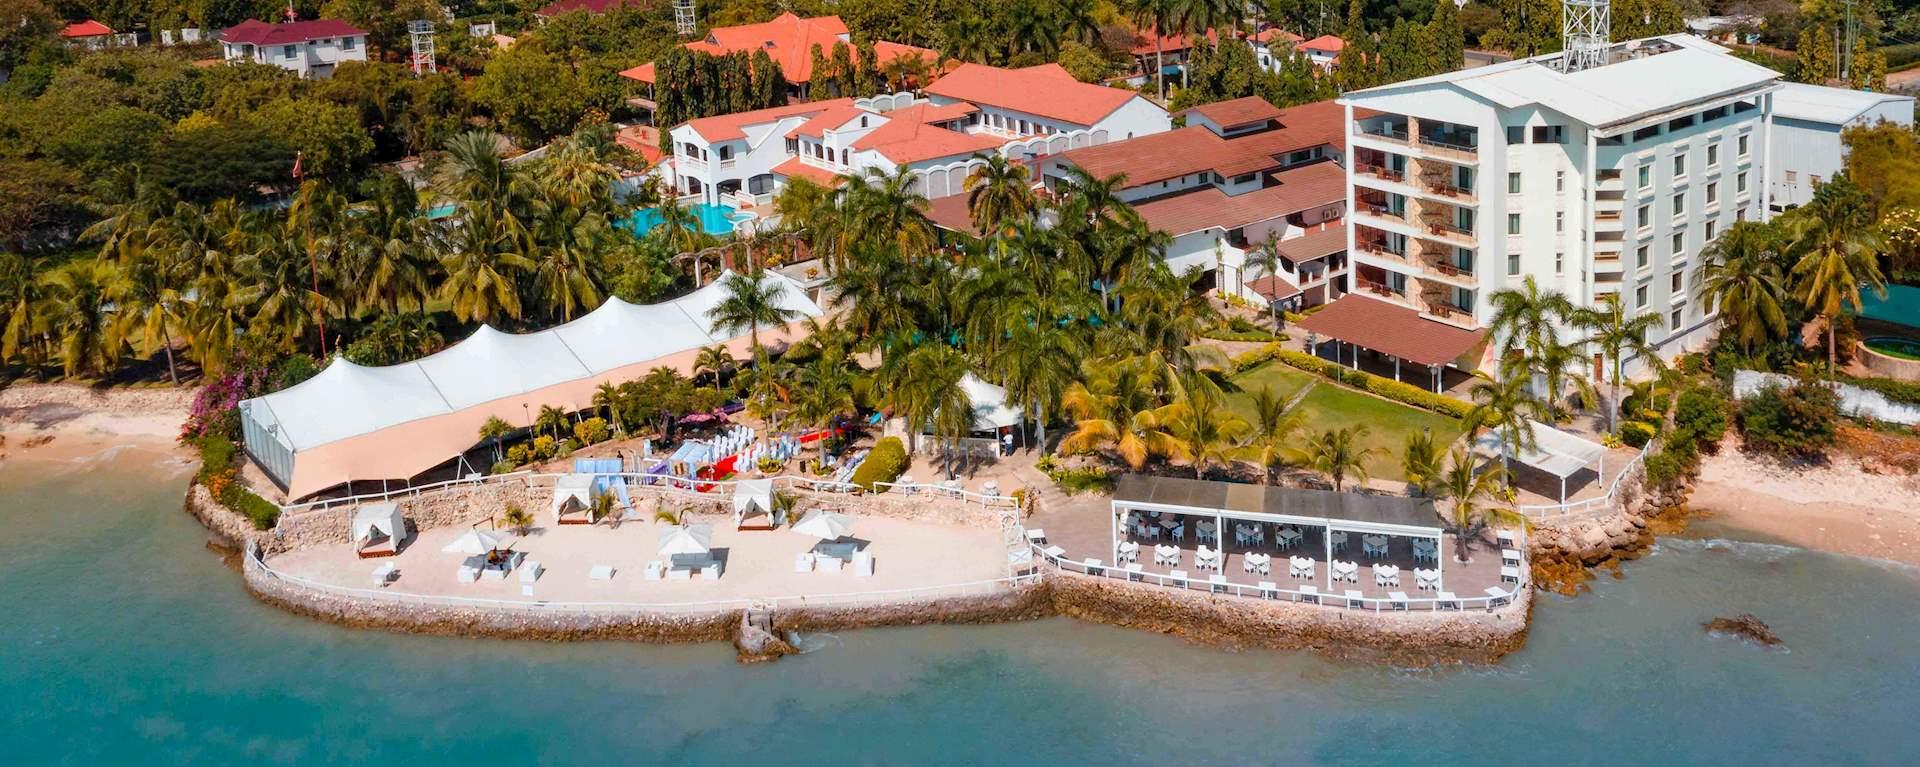 Best Western Coral Beach Hotel 1